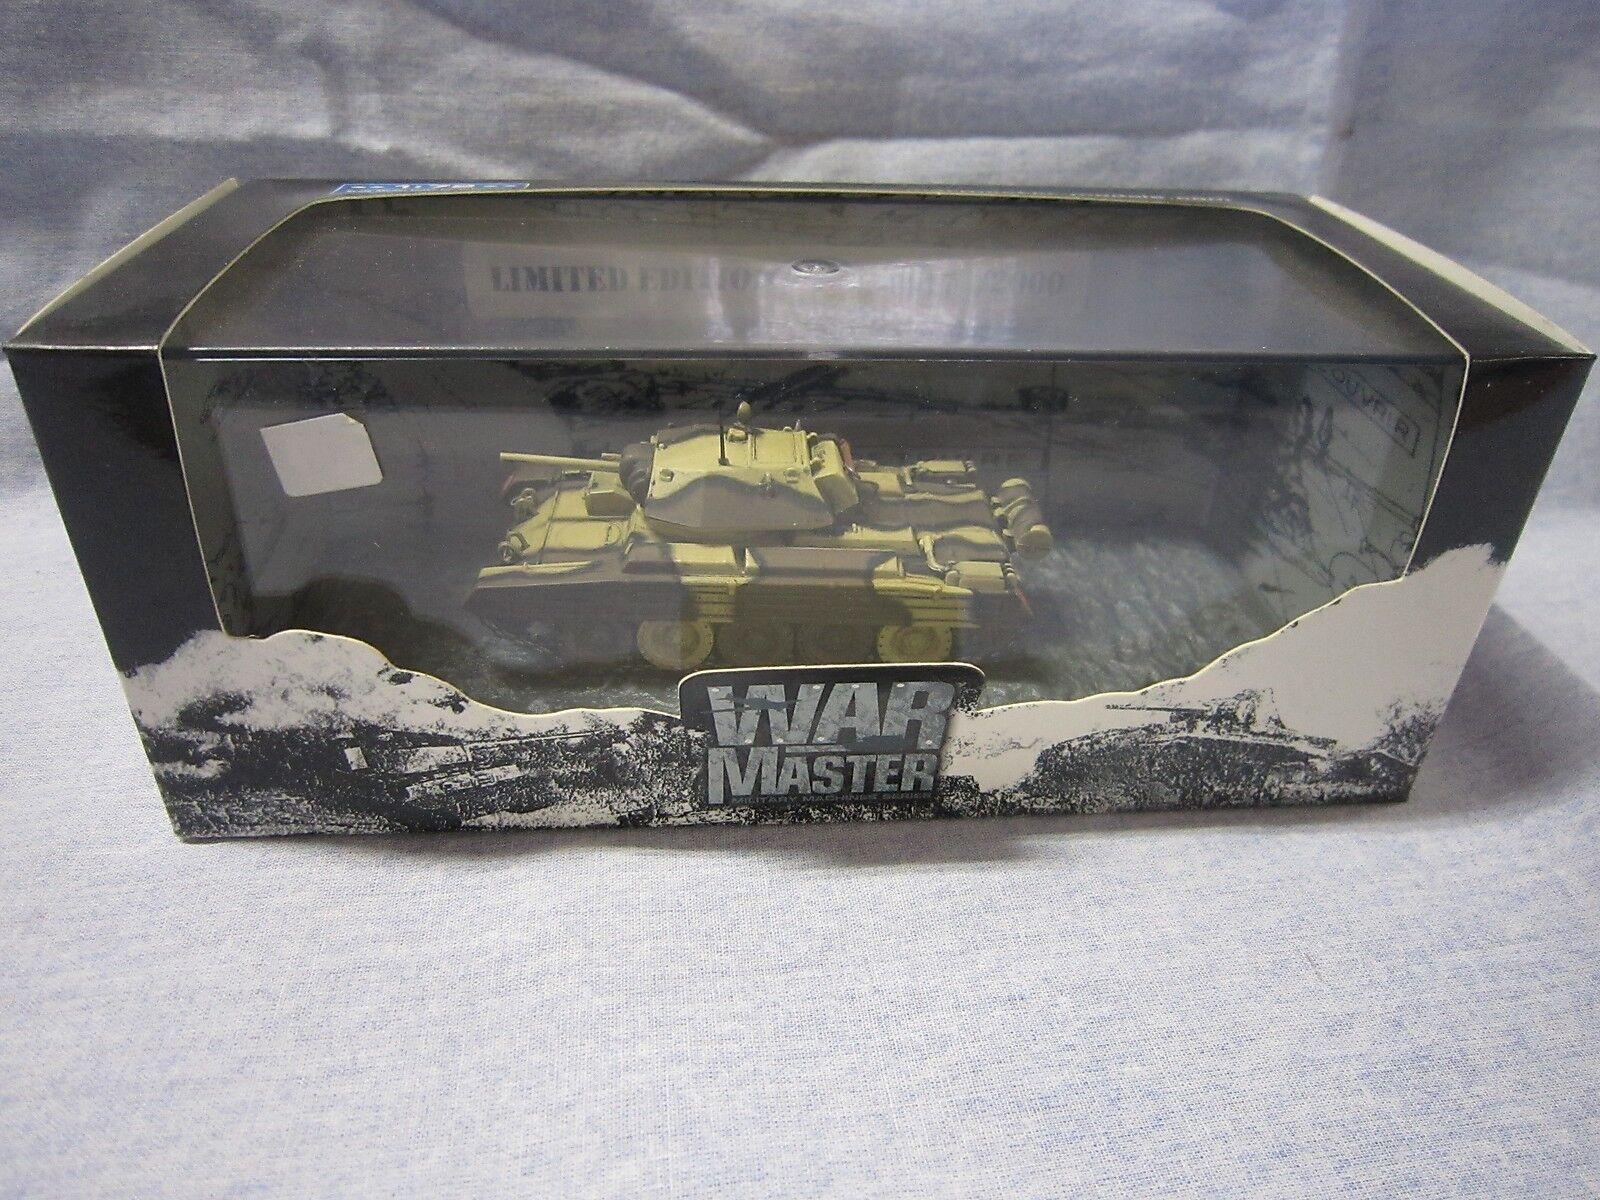 ZA003 WAR MASTER CRUISER MK IV A CRUSADER North Africa 1943 1 72 TK007 Ed Lim NB